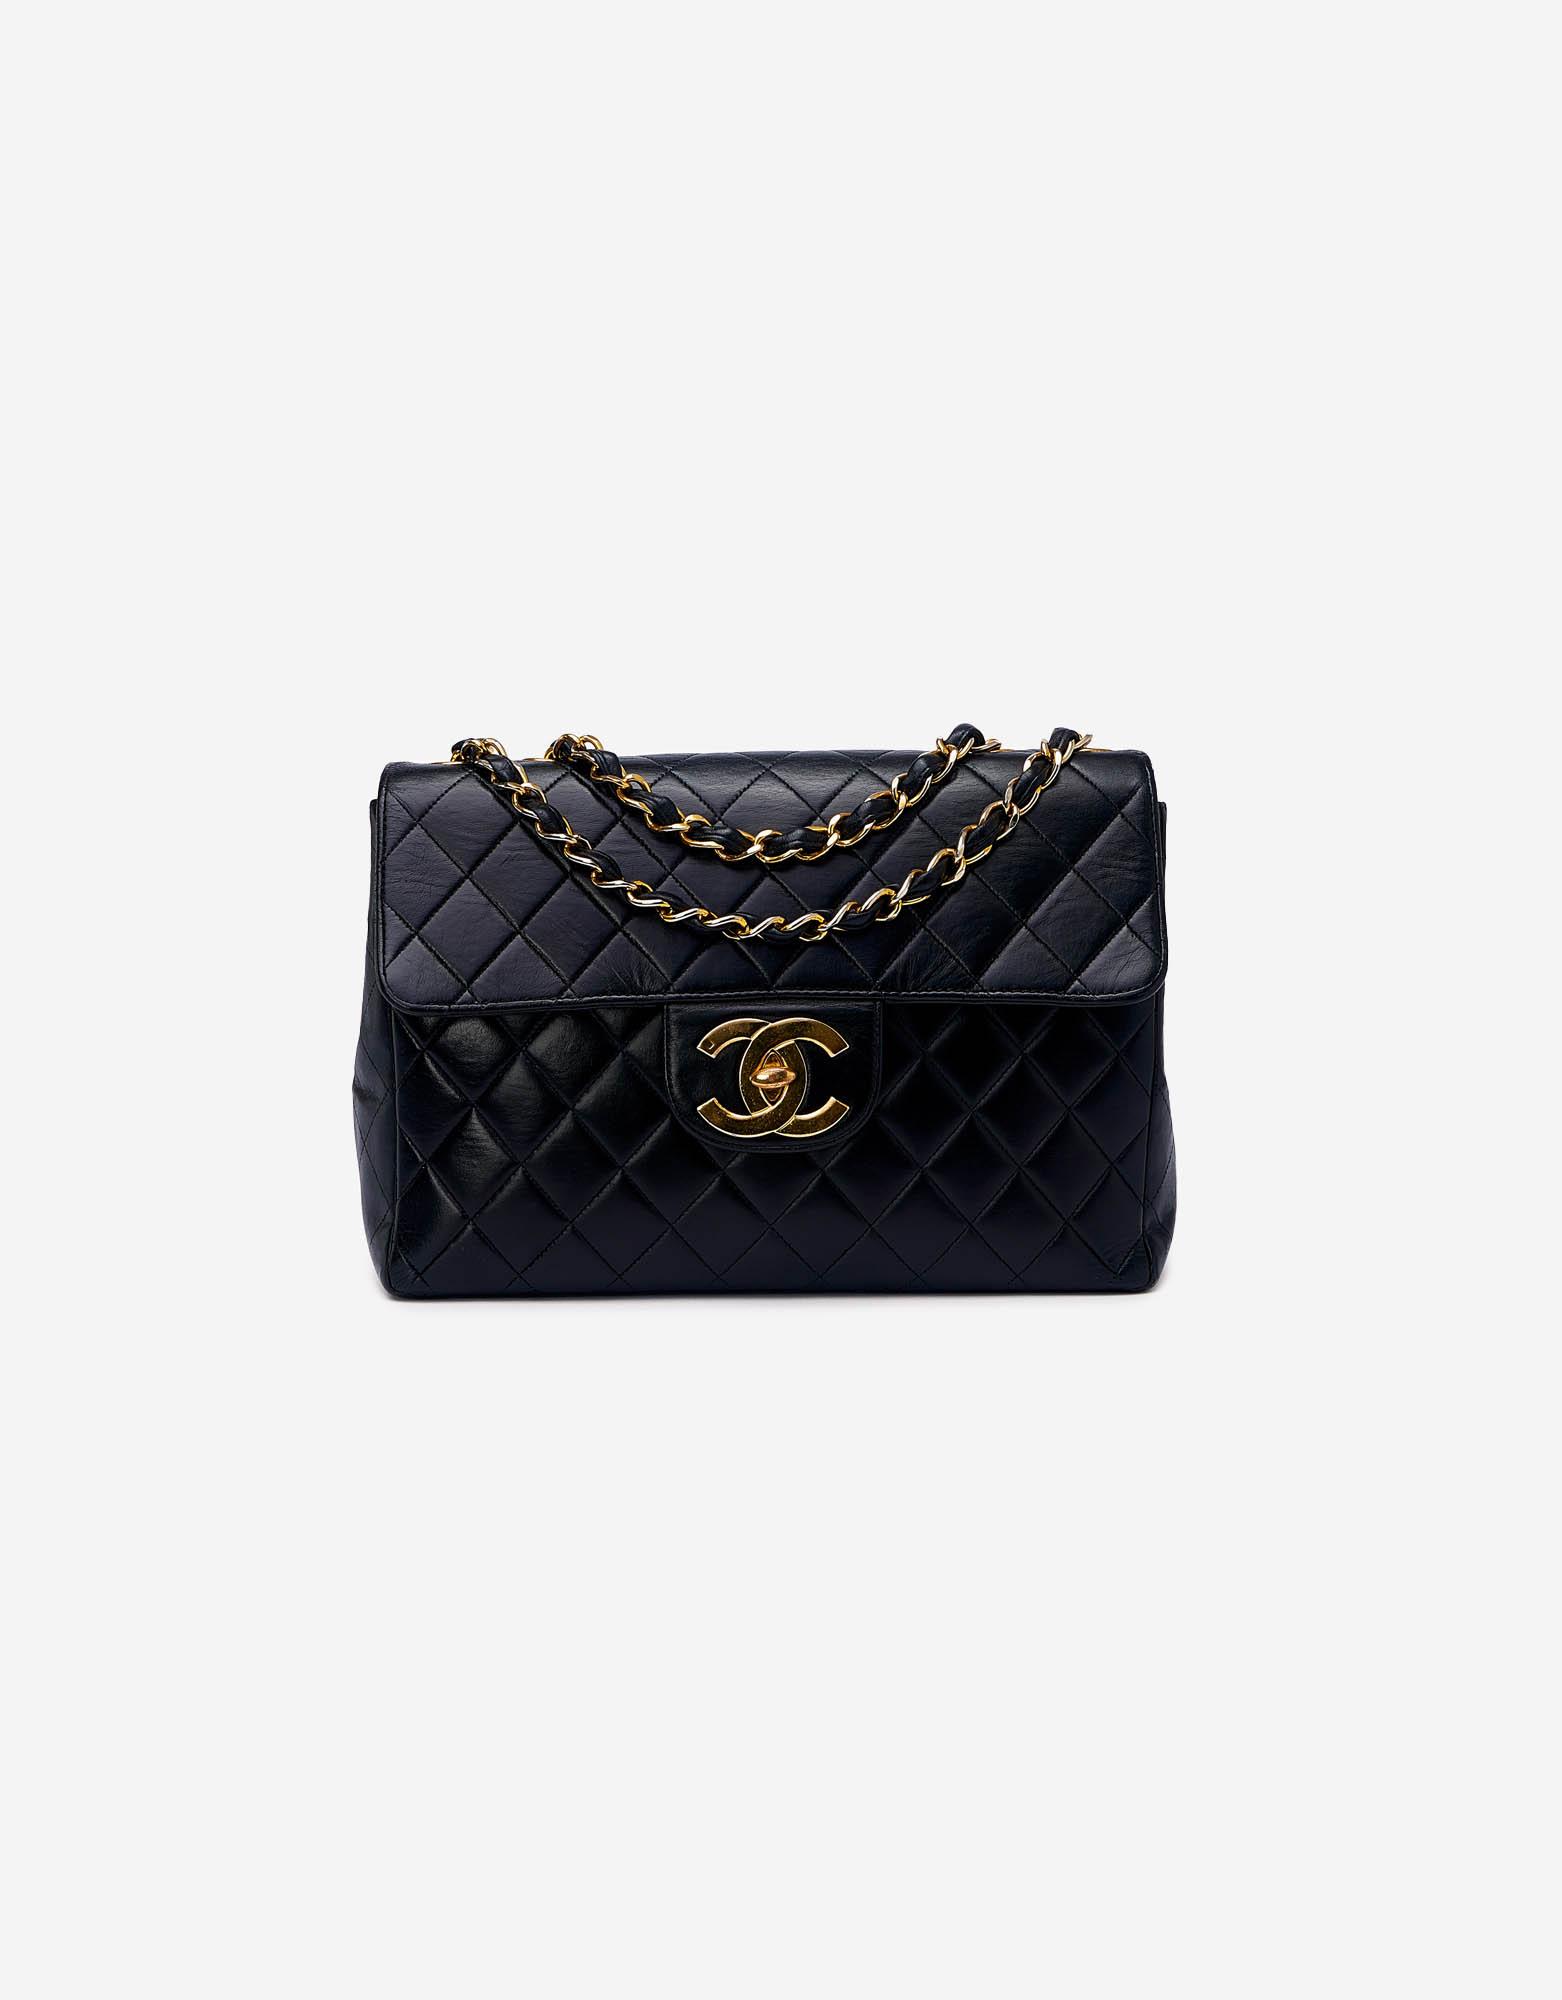 Chanel Jumbo Calfskin Black Vintage Saclàb